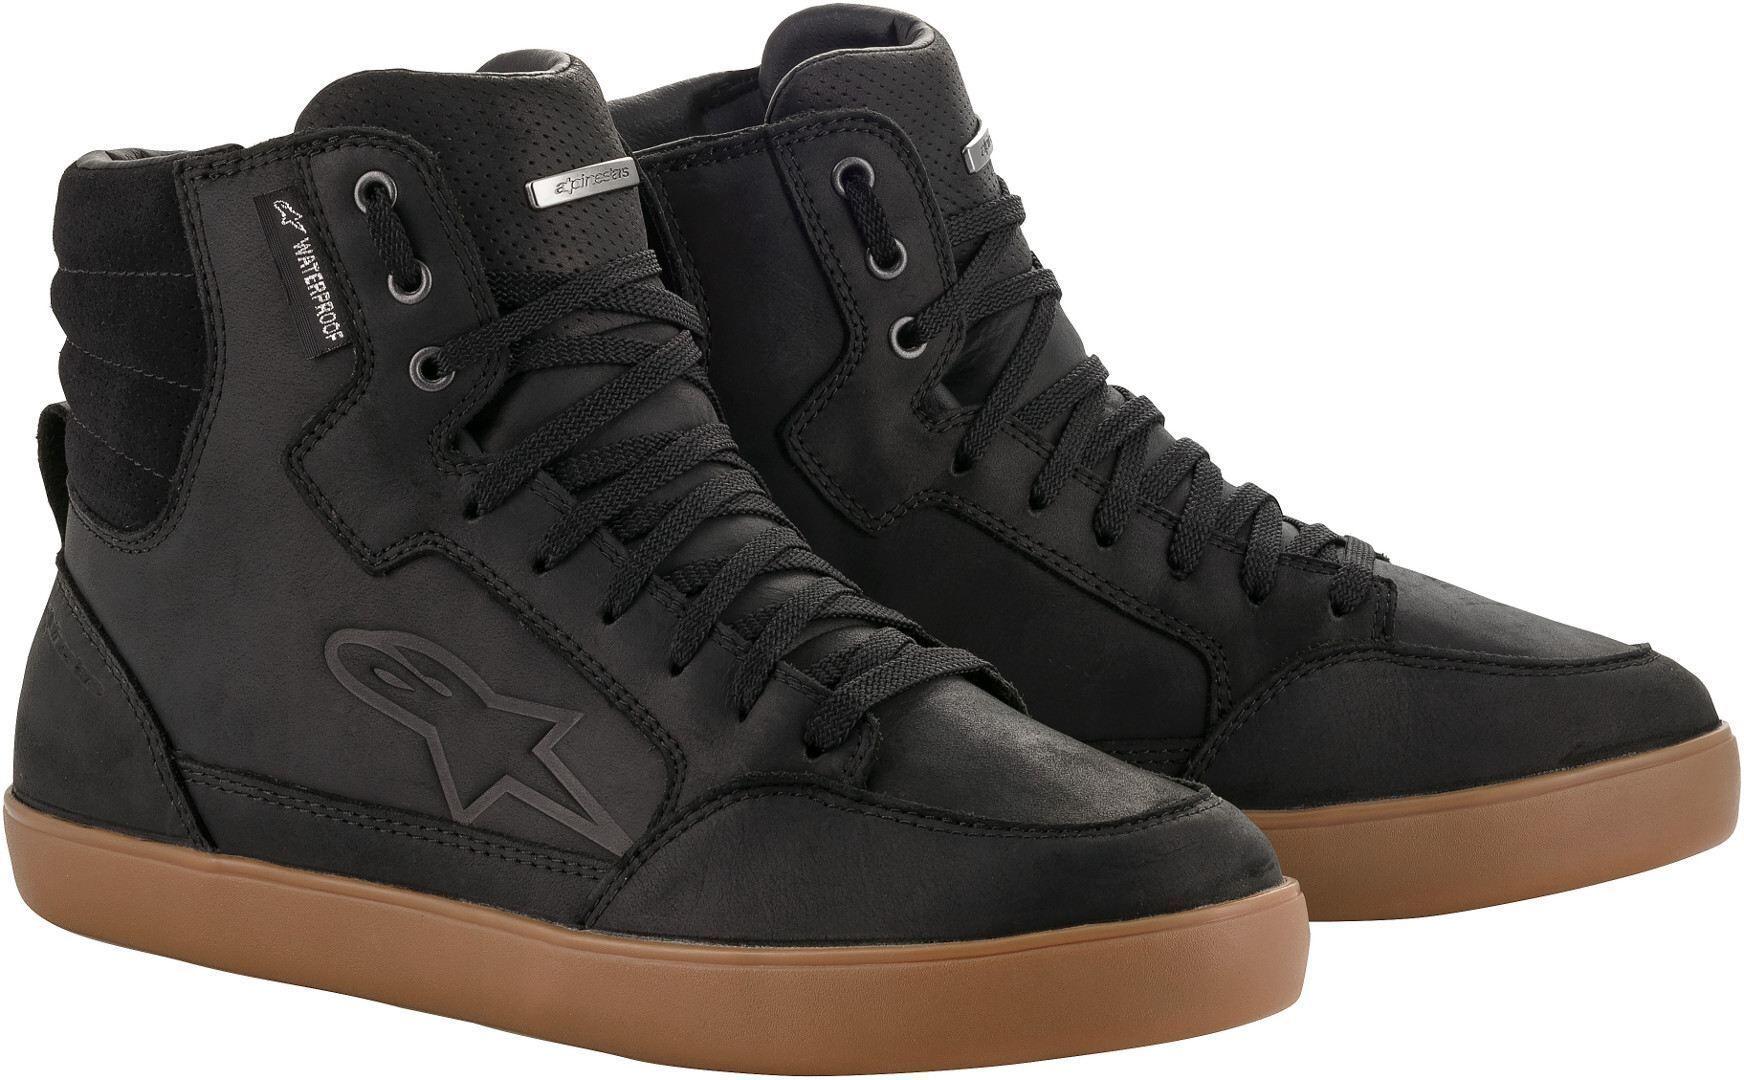 Alpinestars J-6 Chaussures imperméables Noir Brun taille : 45 46